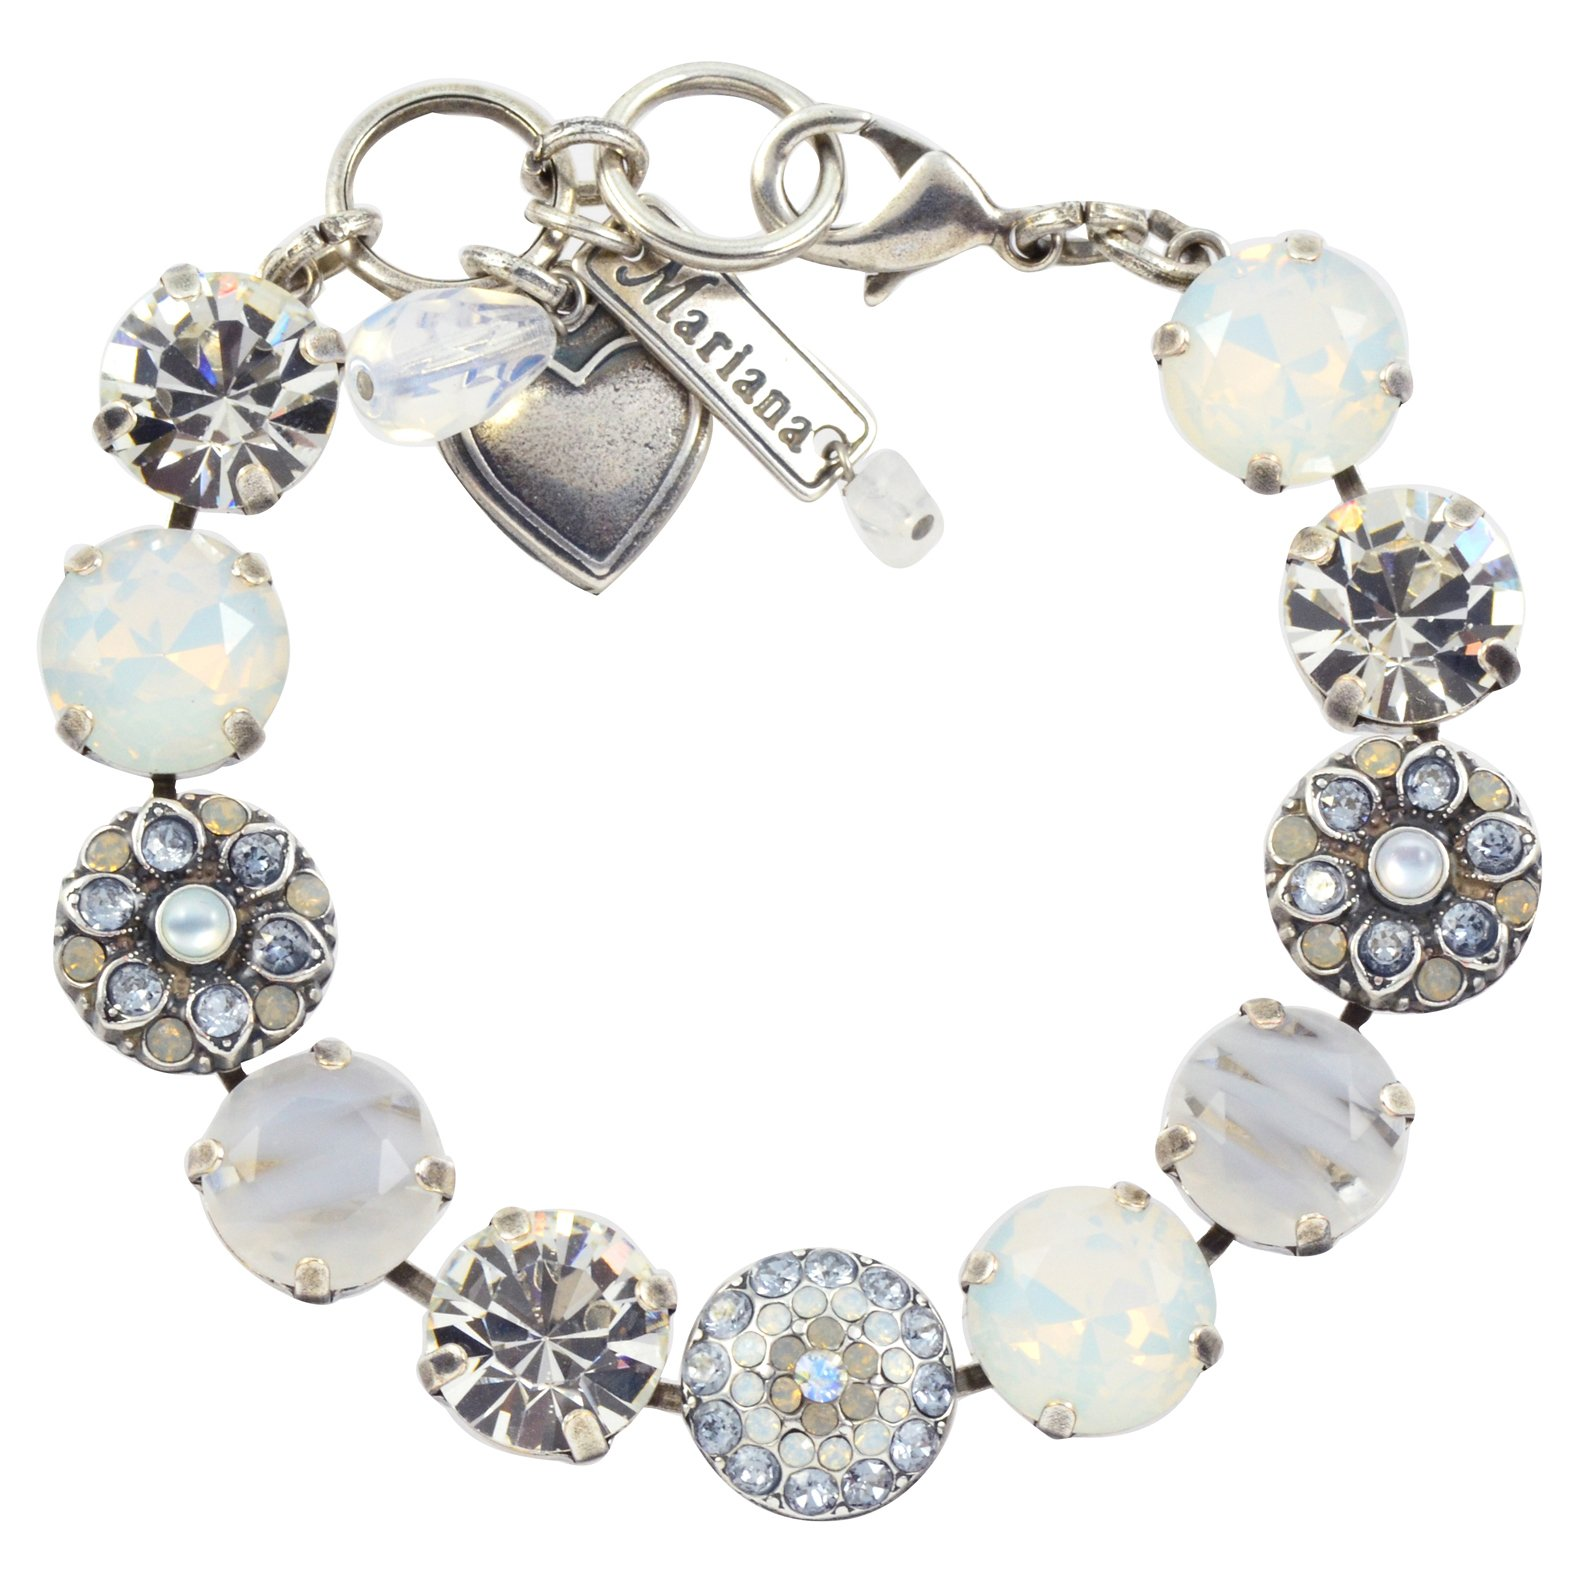 Mariana Silk Guardian Angel Style Tennis Bracelet, Silver Plated, 8'' 4501/1 1049